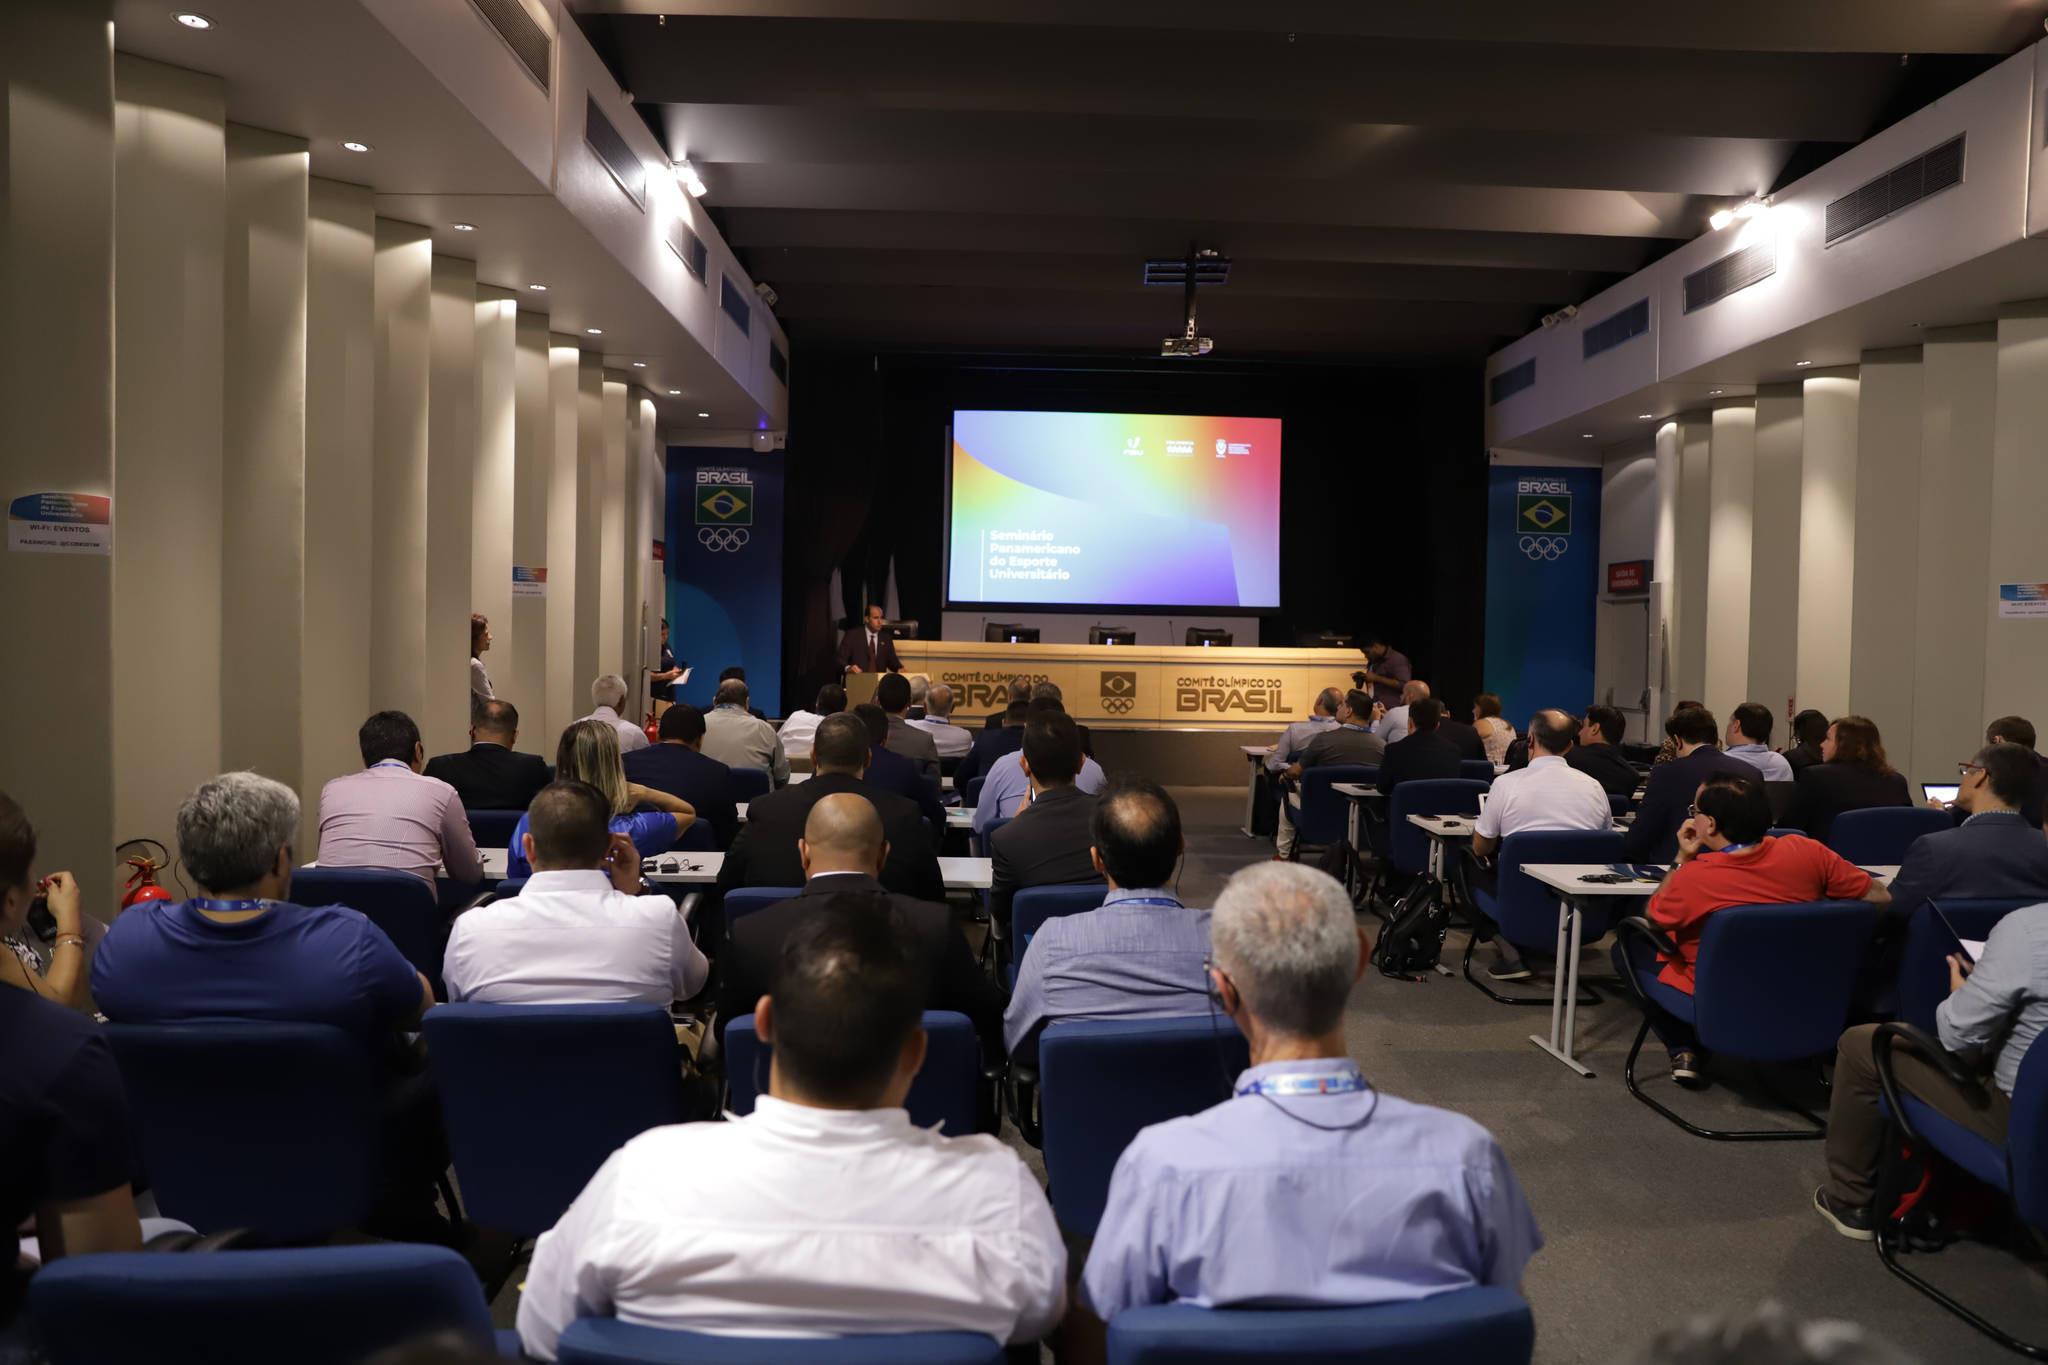 Pan American University Sports Seminar begins in Rio de Janeiro